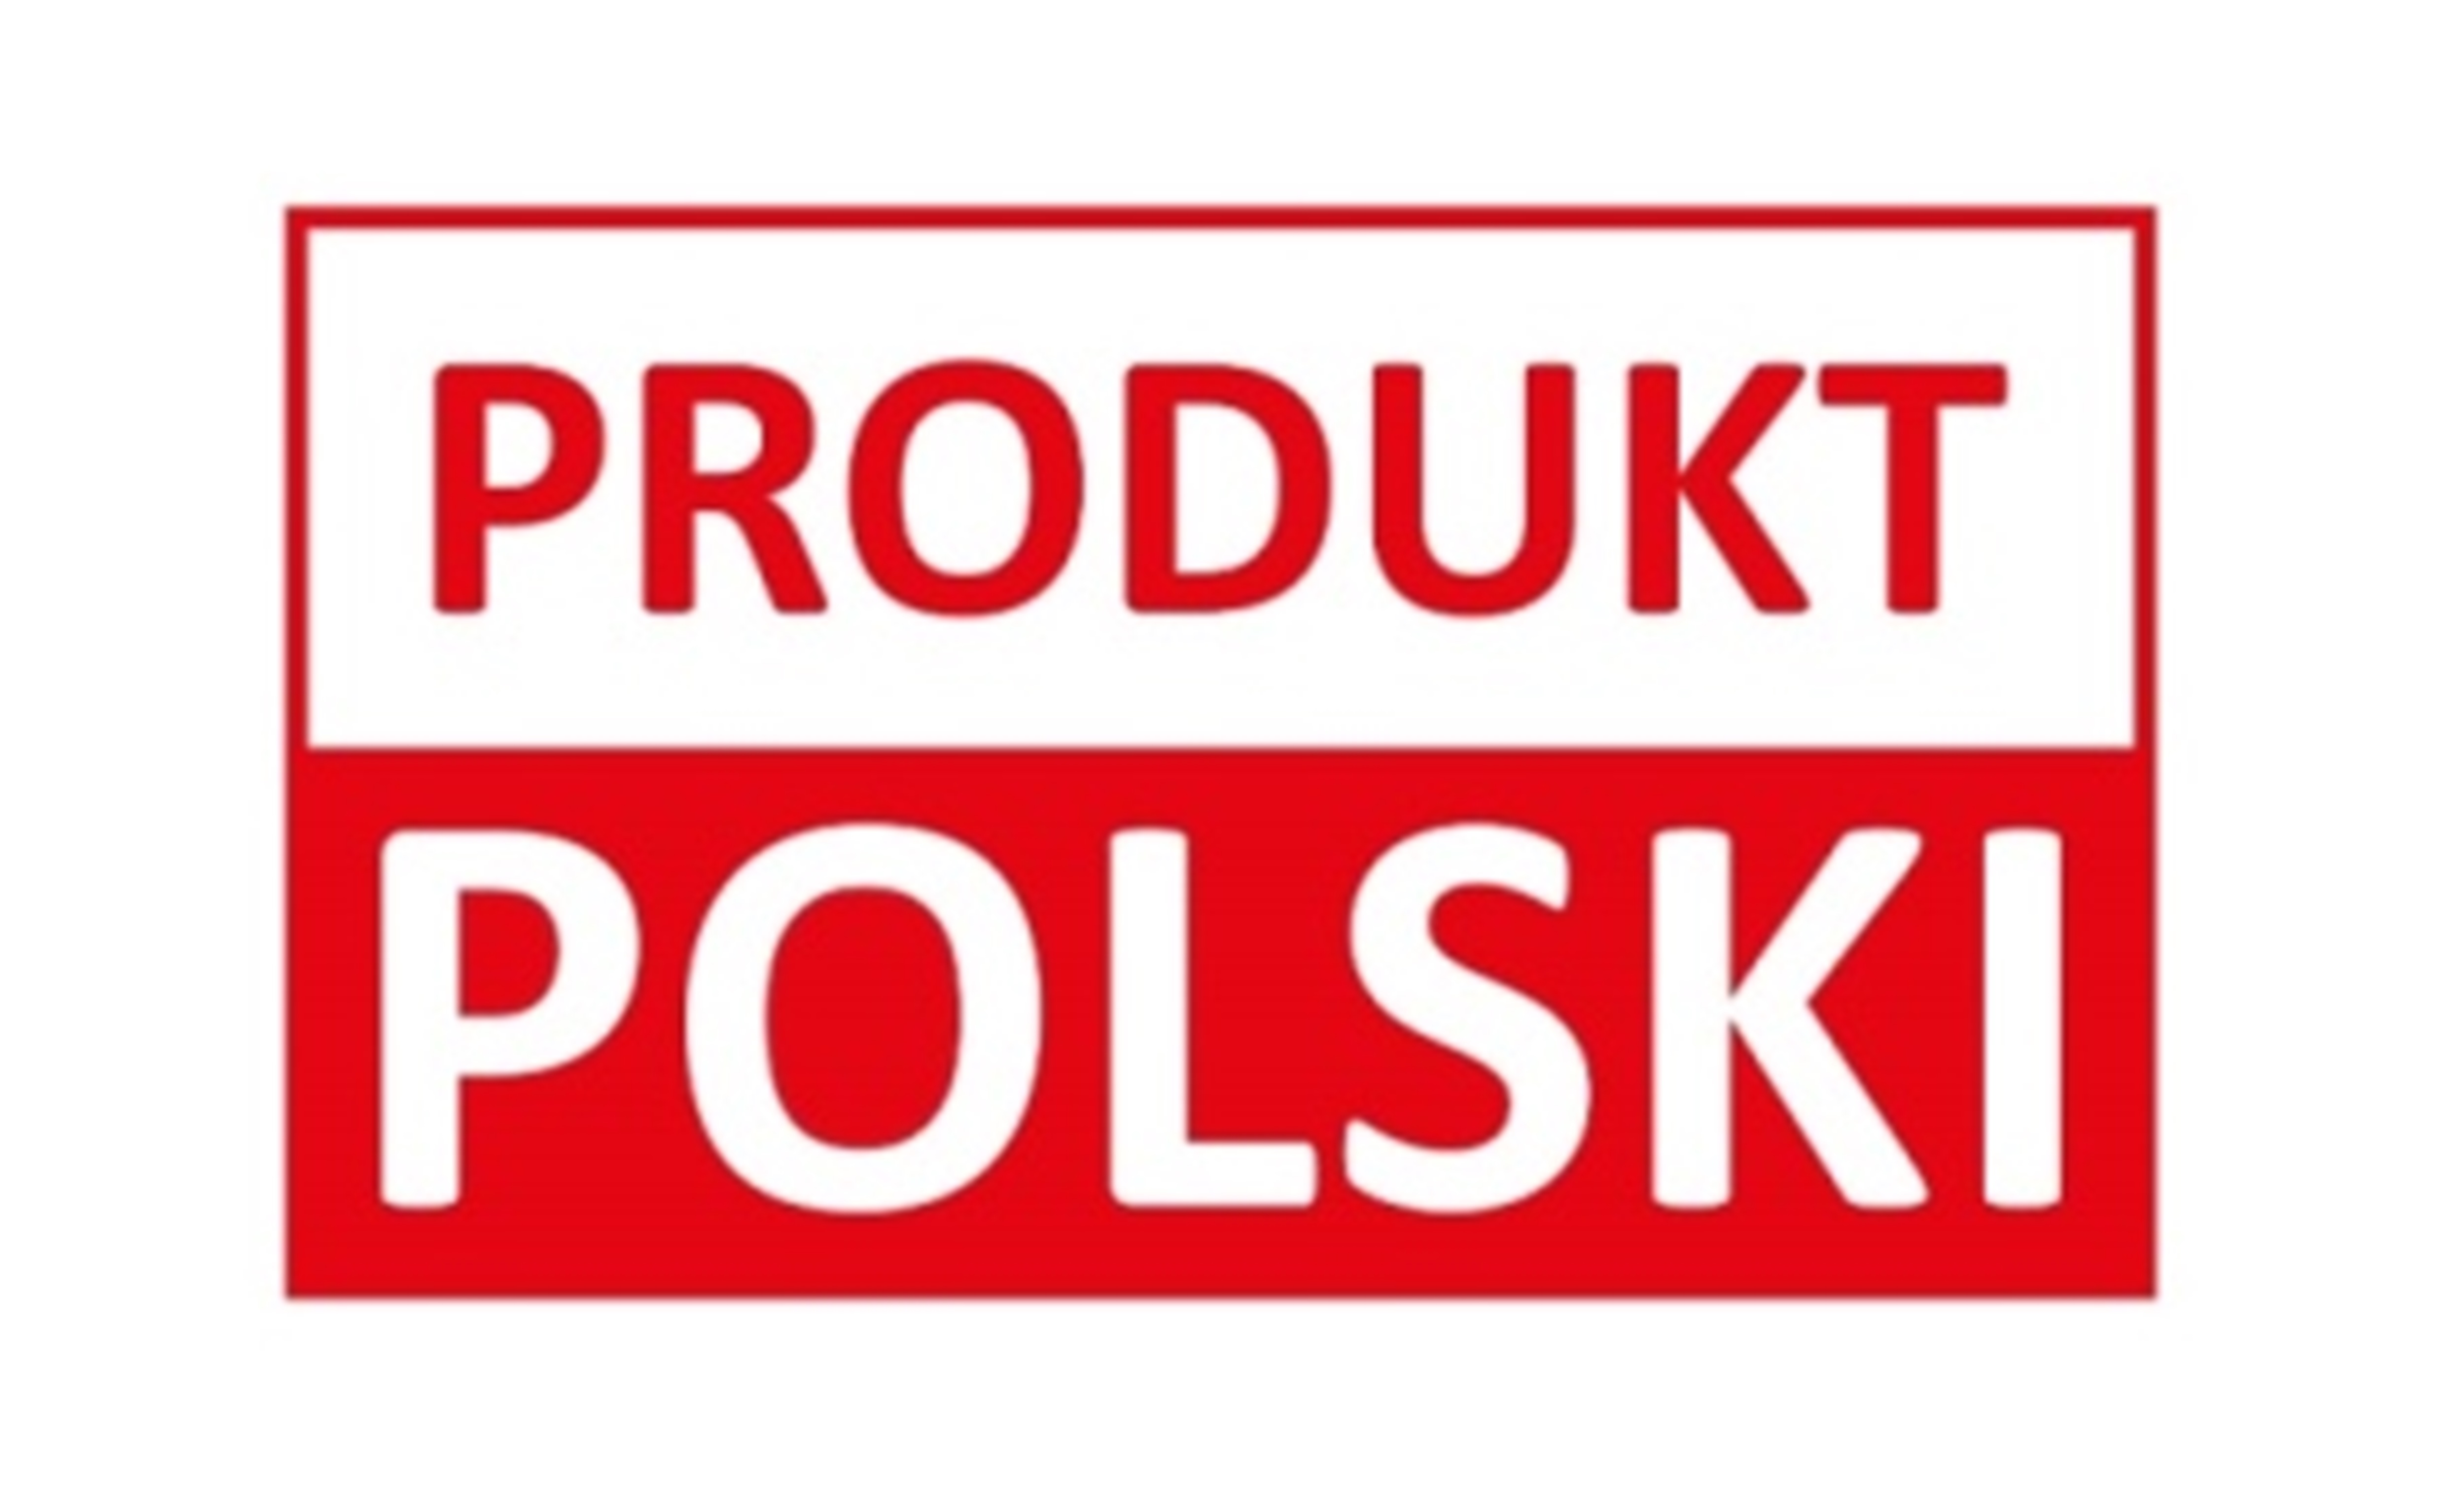 PRODUKT POLSKI - POLSKA SMAKUJE